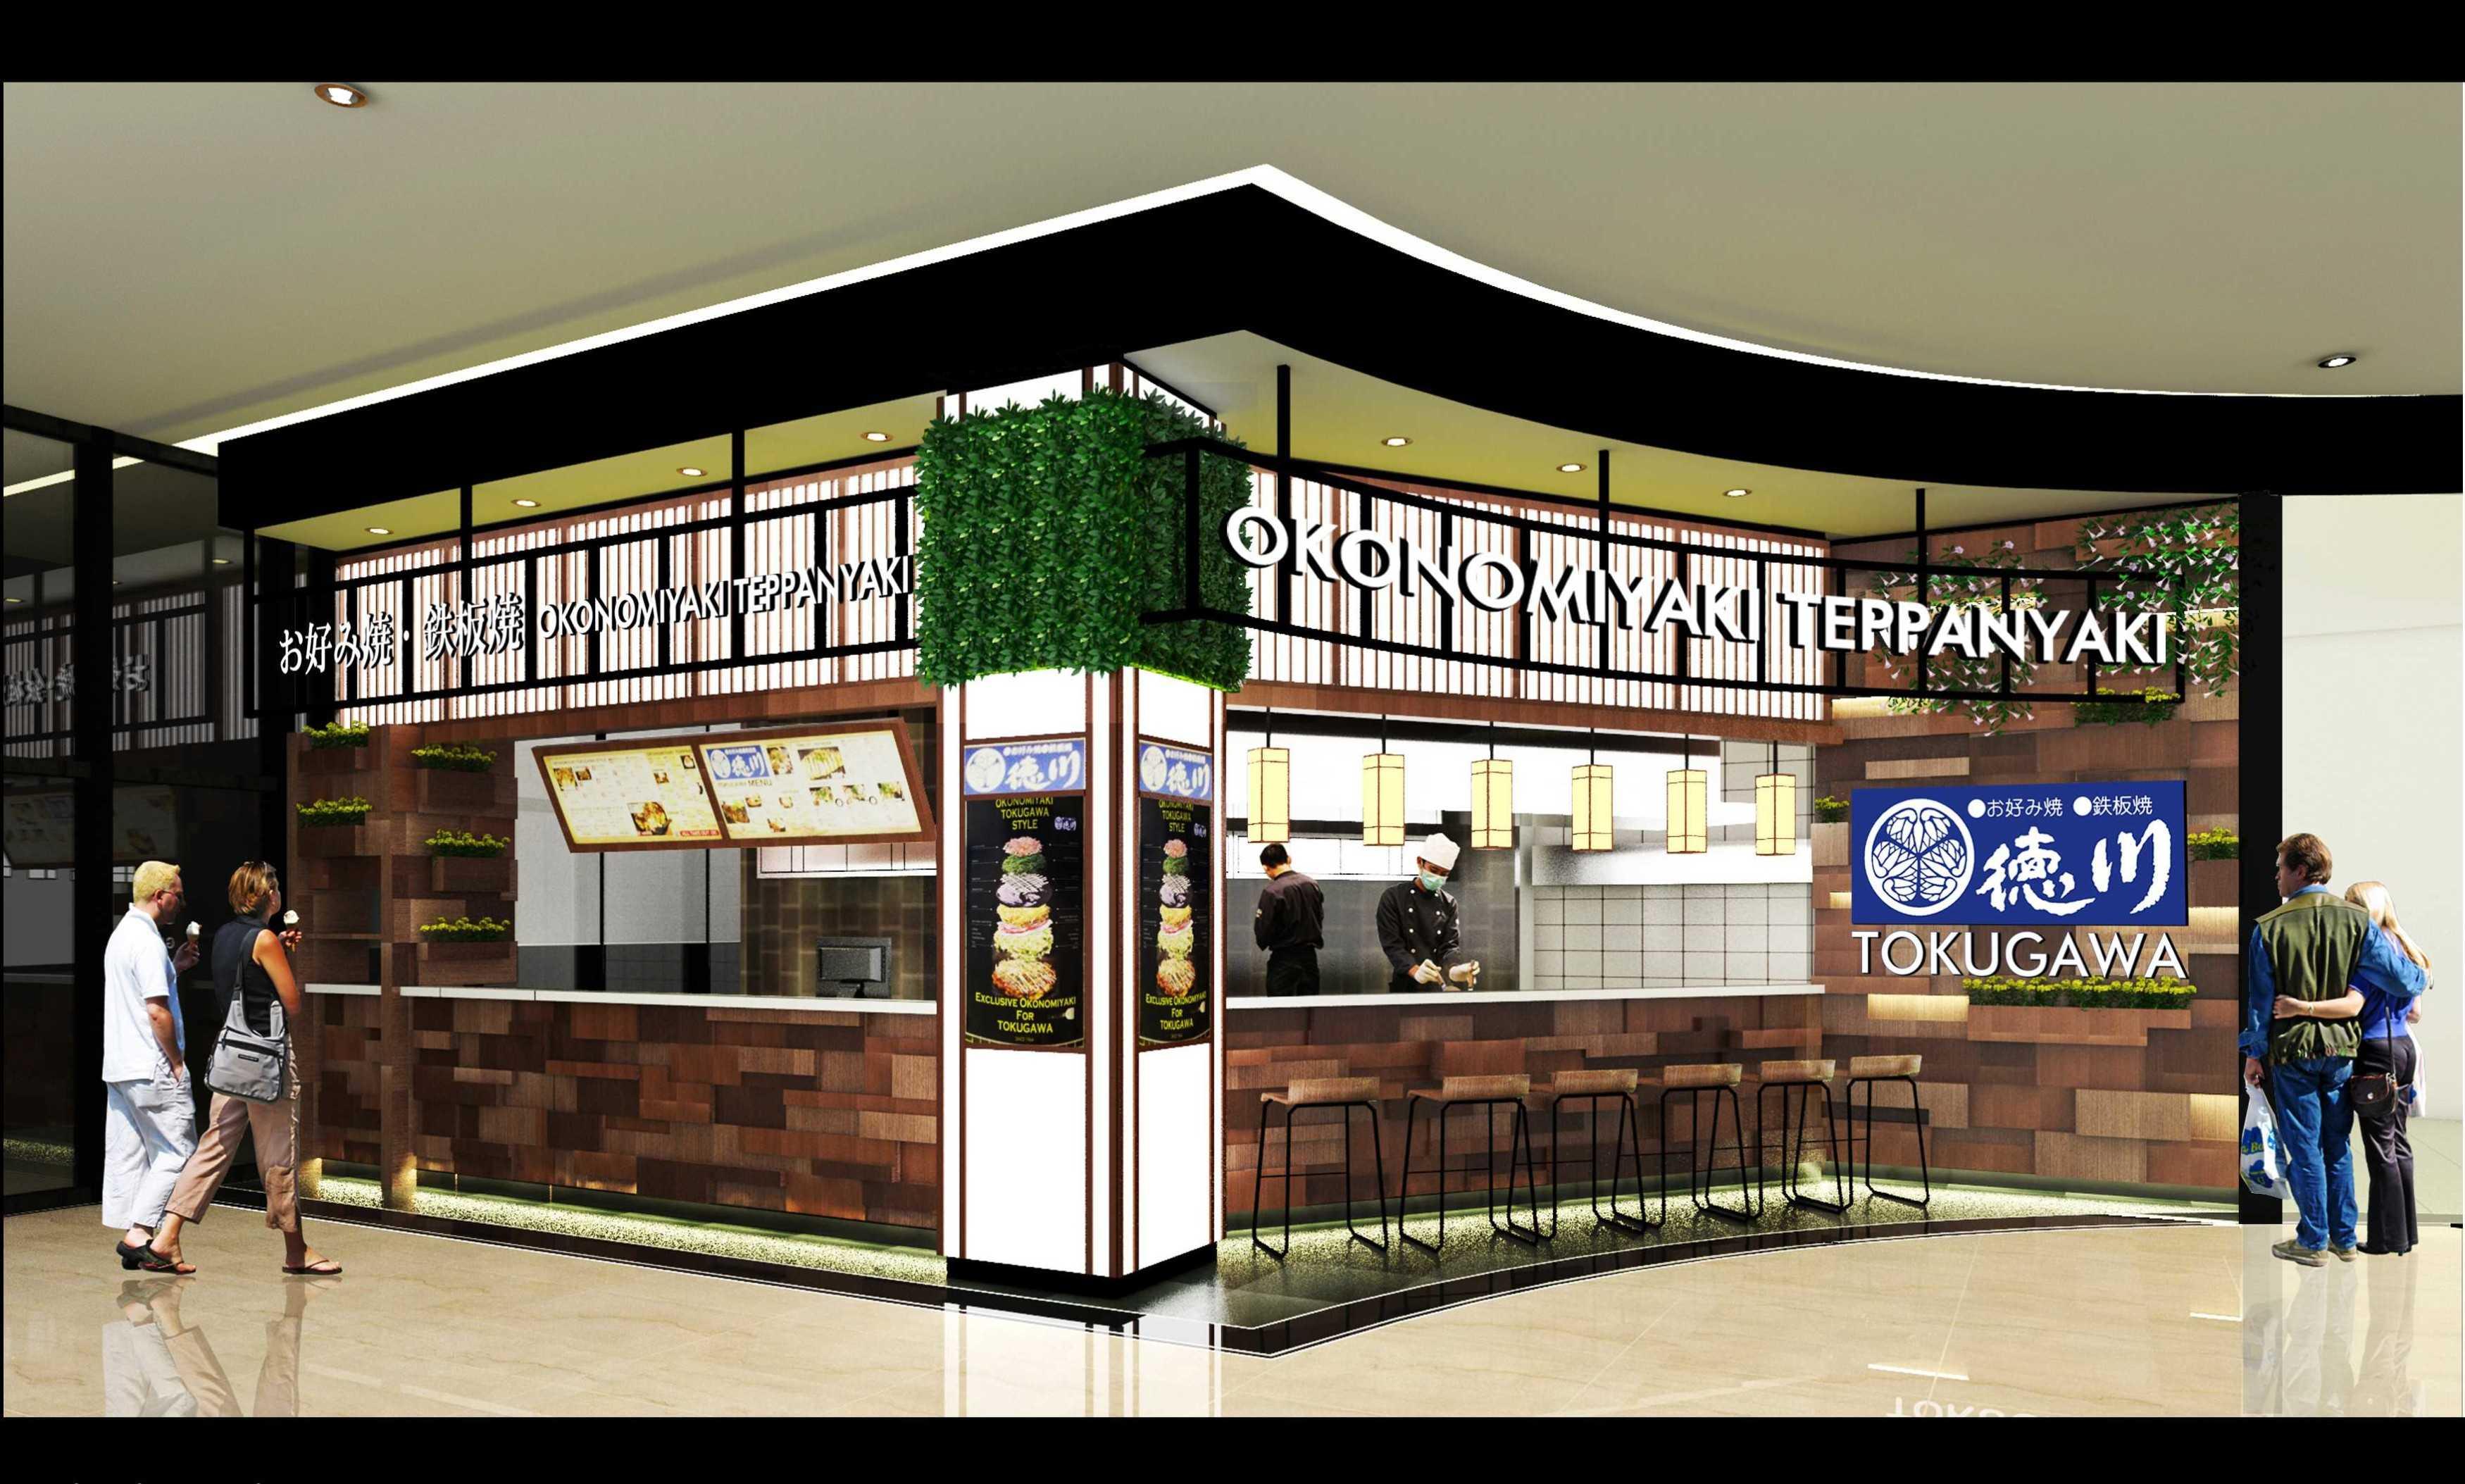 Staircasenine aeon mall project retail yamatoya o gi tokugawa ps